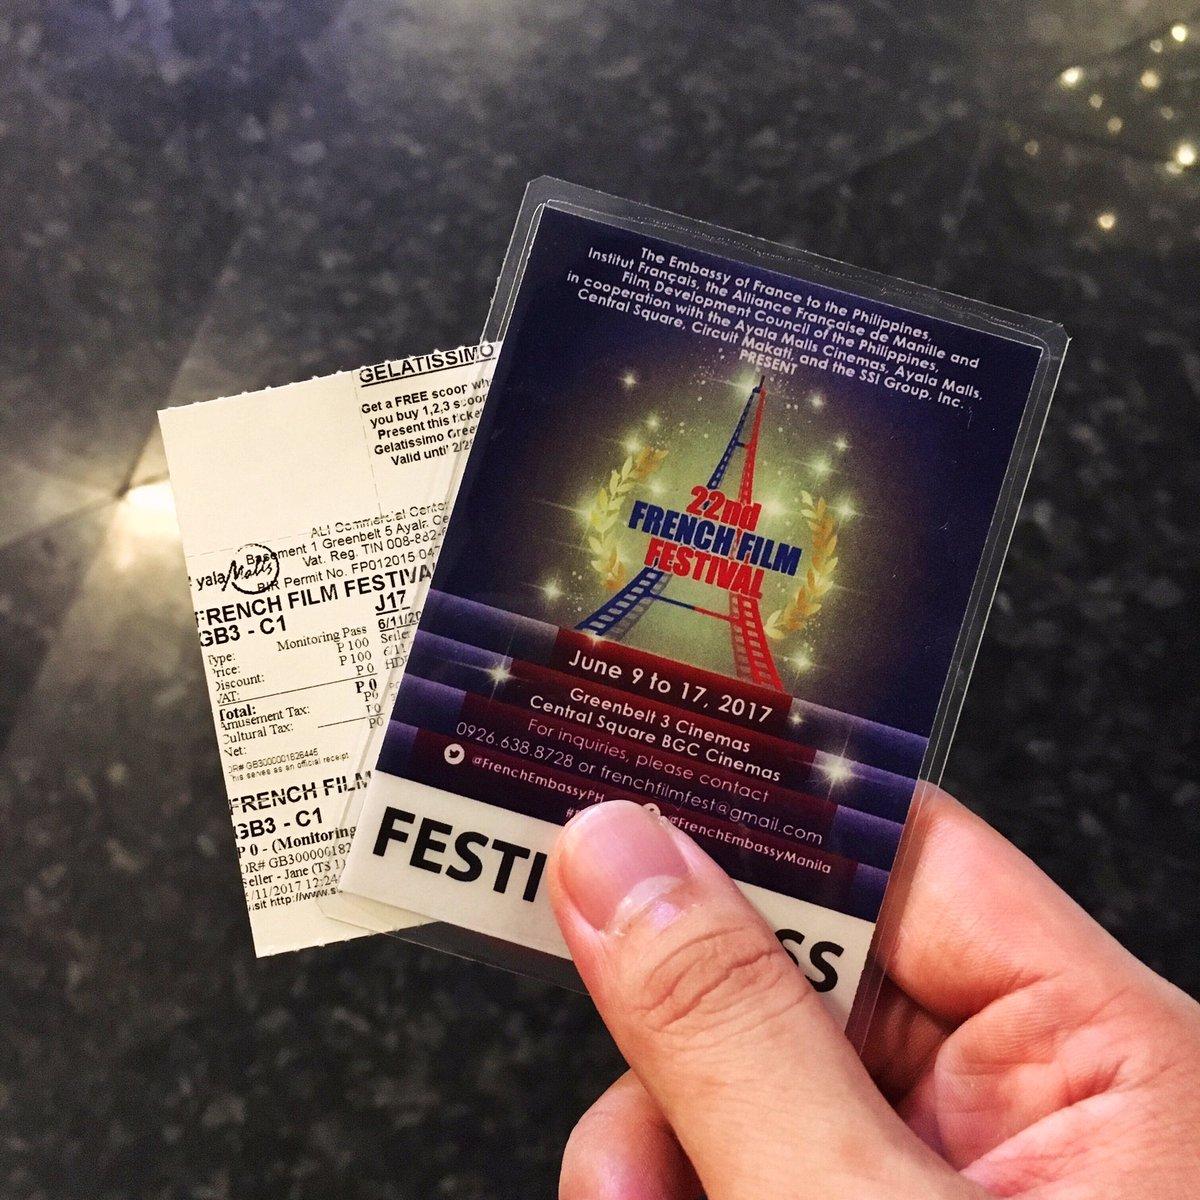 frenchfilmfest22 hashtag on Twitter